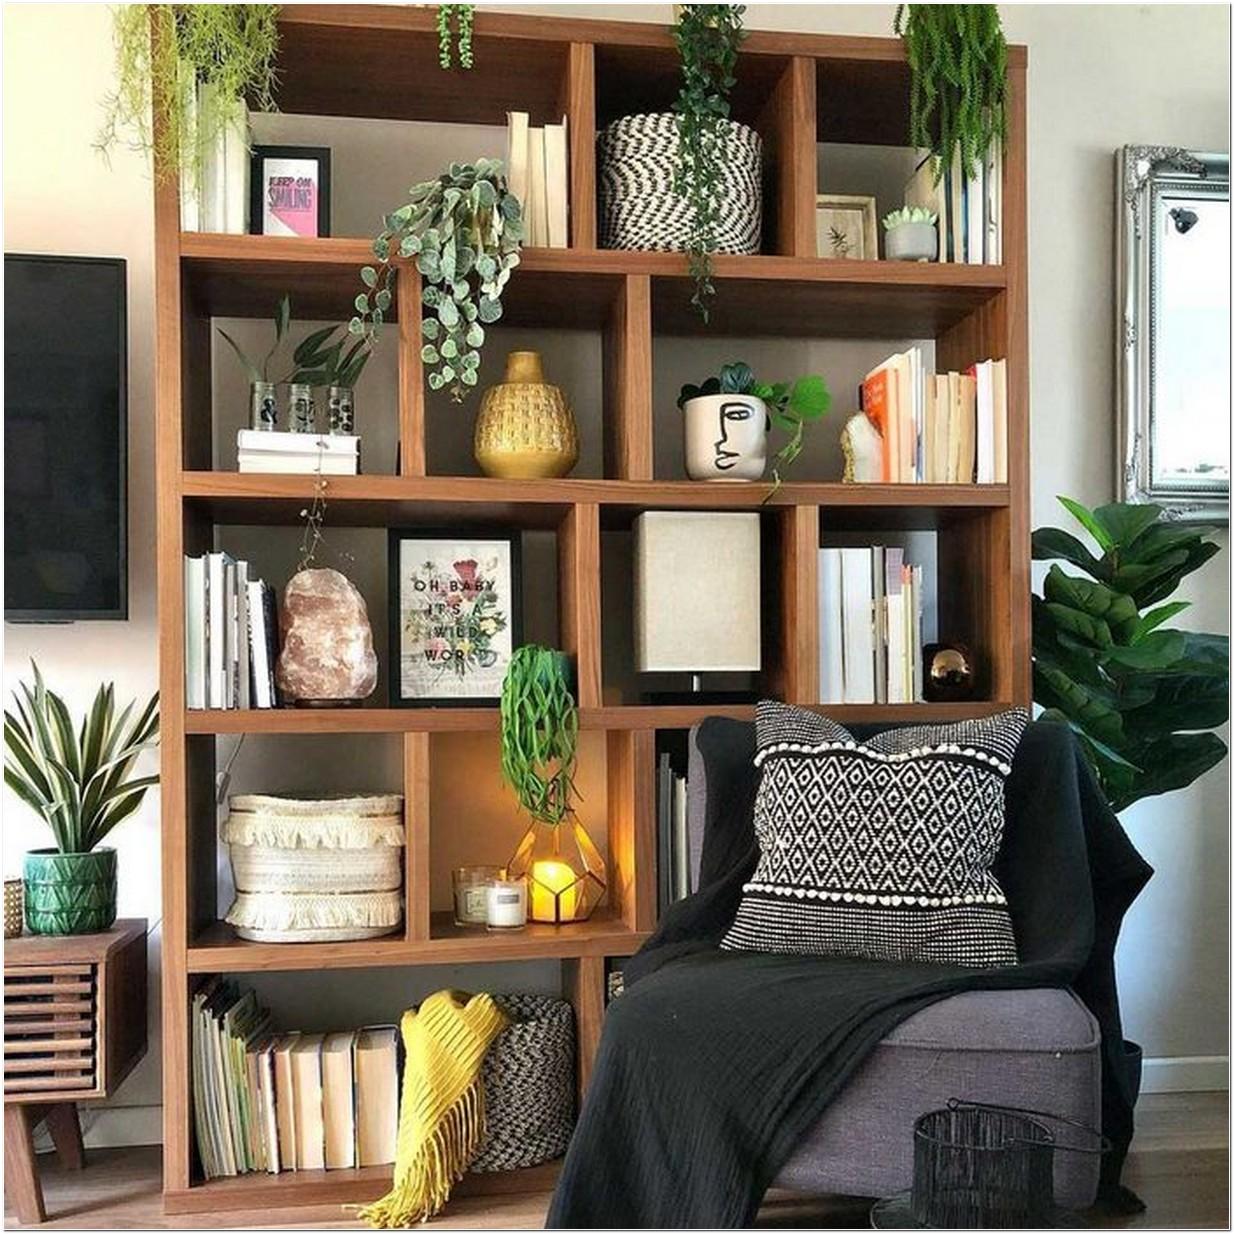 10 Best Living Room Shelving Arrangements